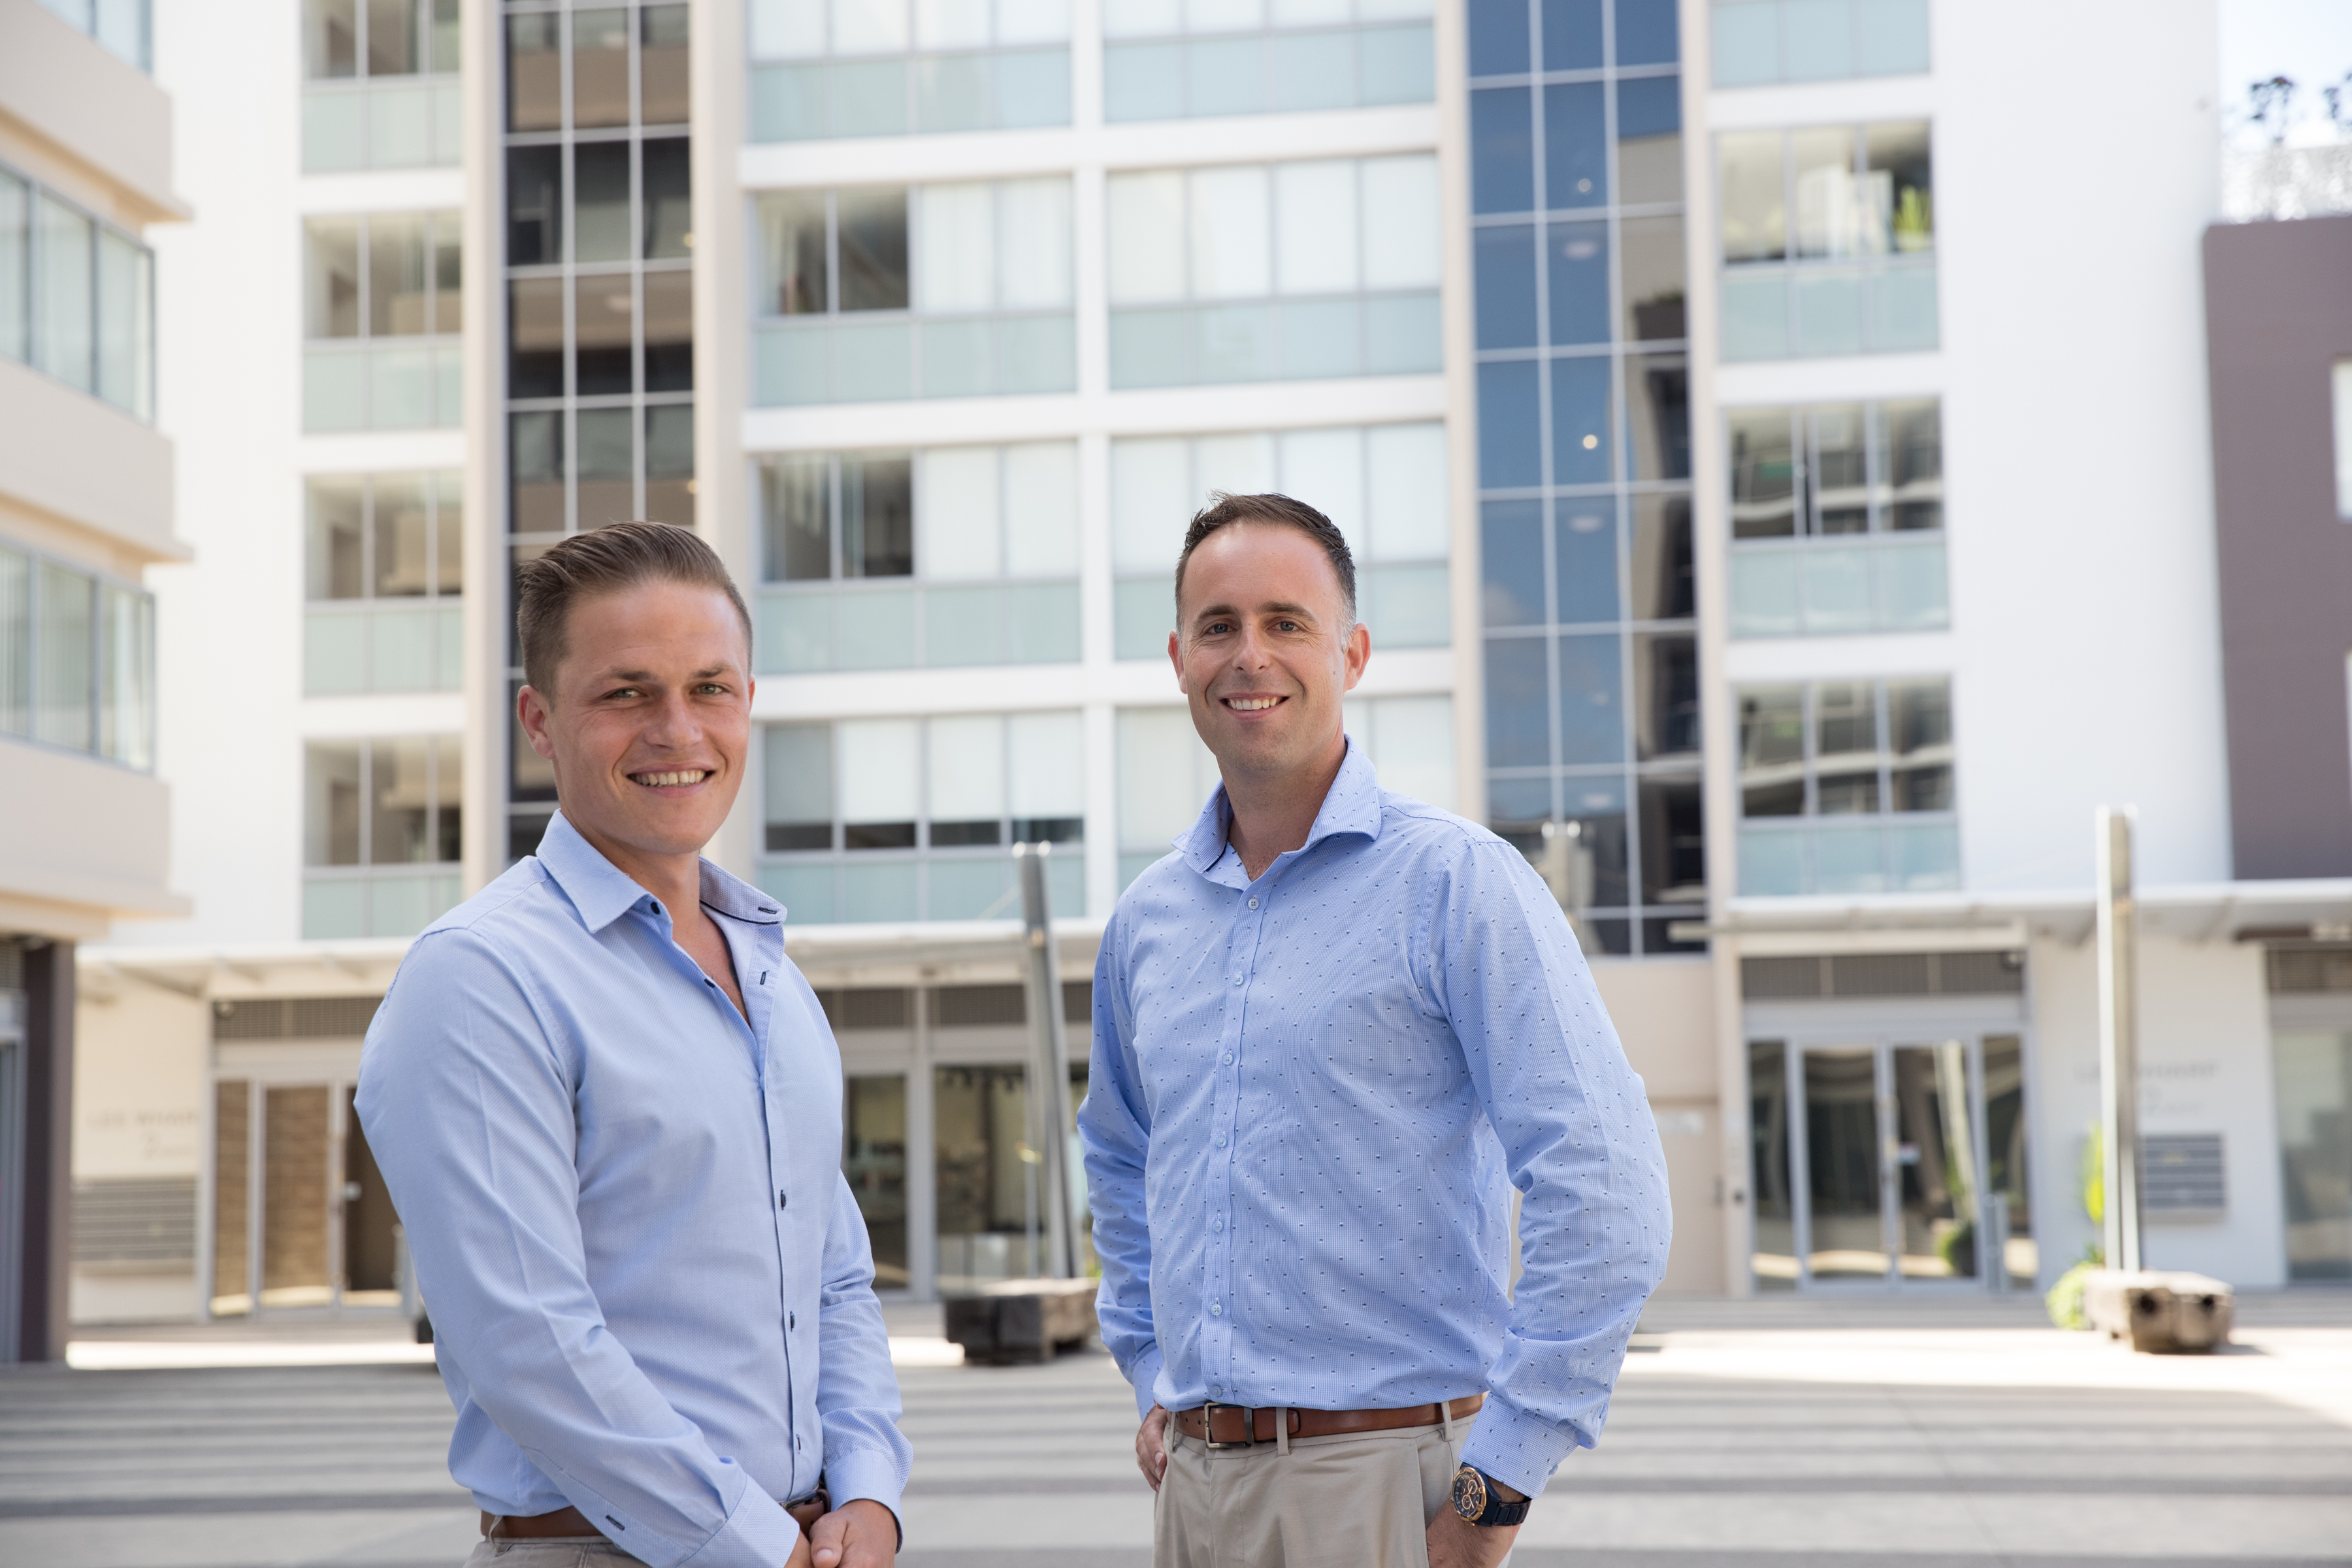 Simon Mitrovich Tony Trinder Real Estate Agents